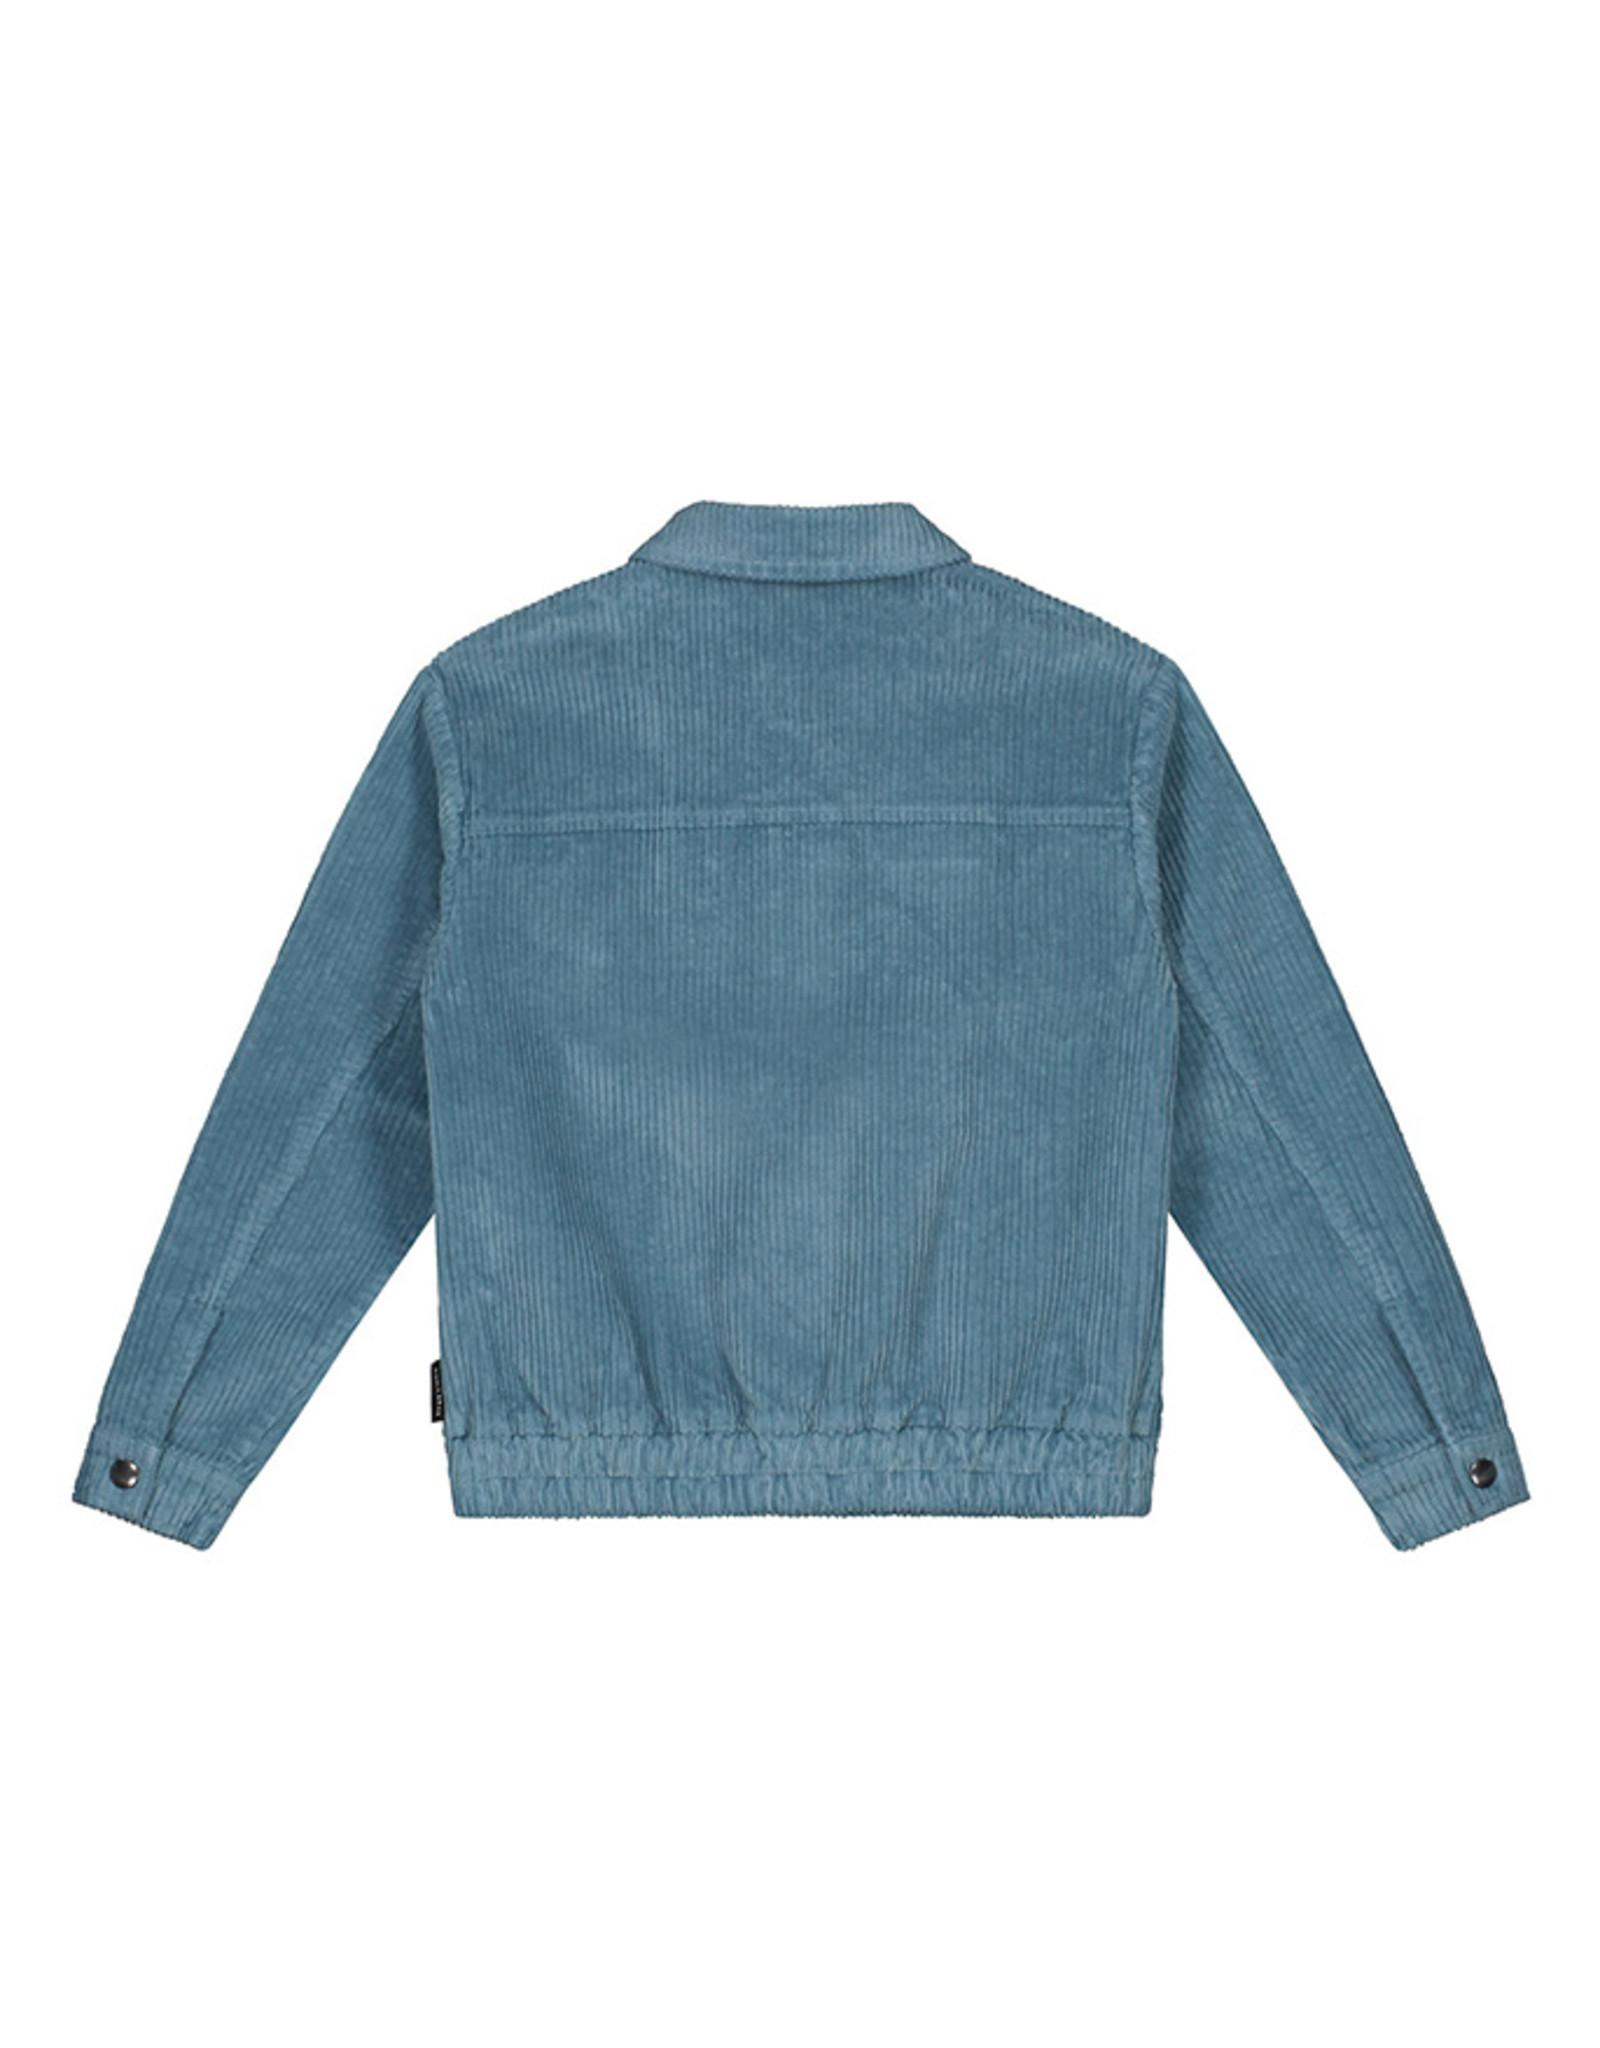 Arden Corduroy Jacket Blue